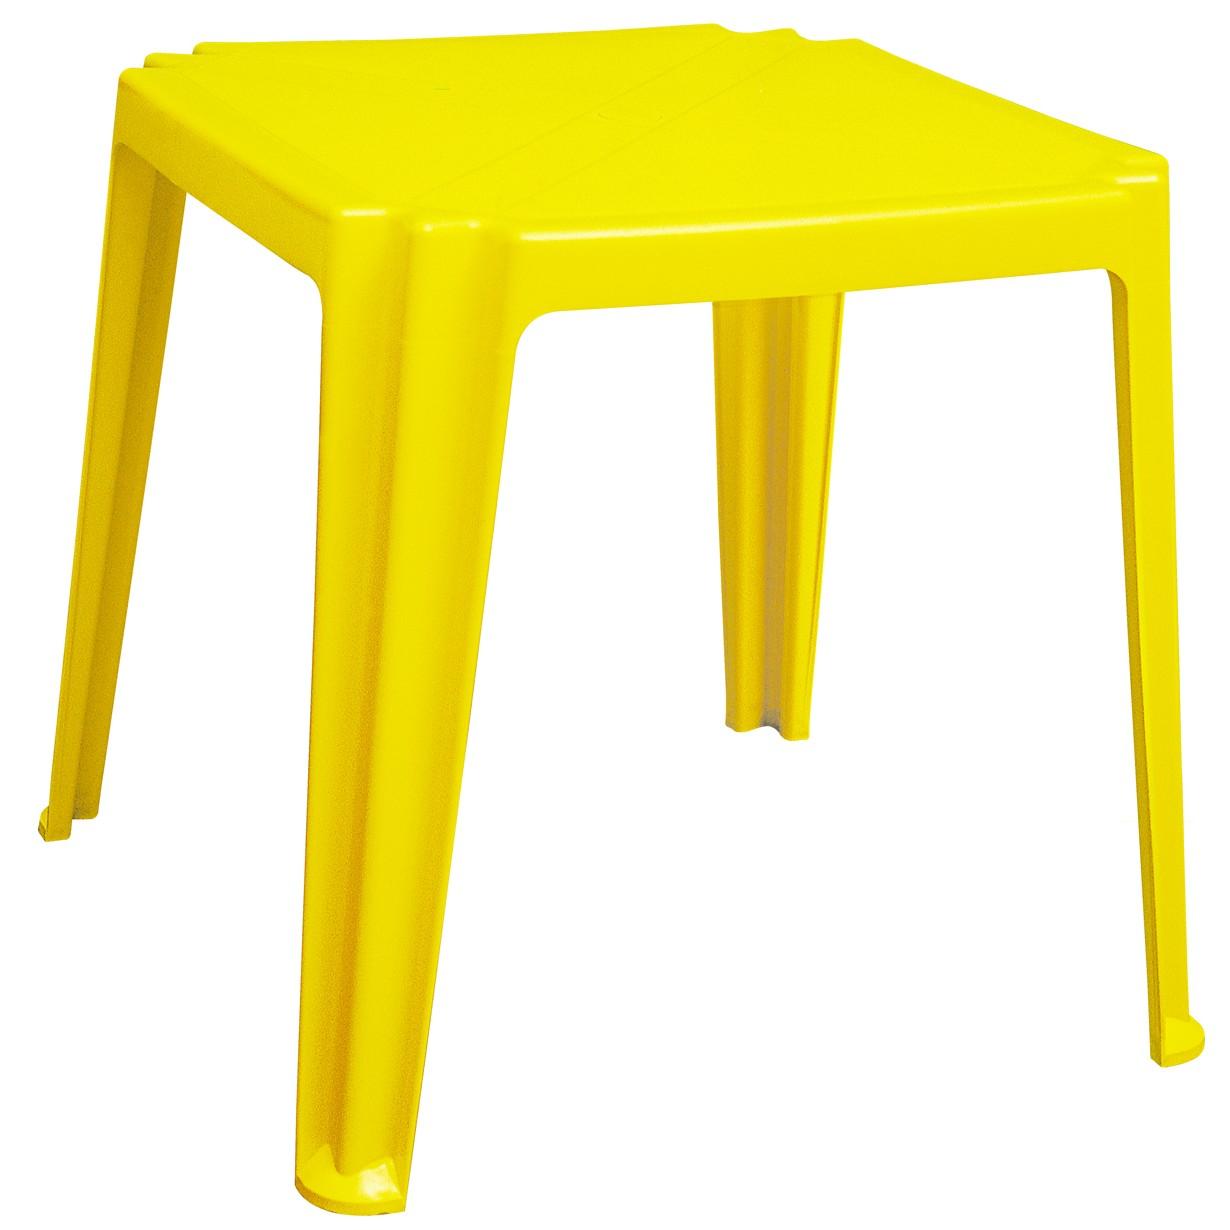 Mesa Quadrada de Polipropileno Basic Amarela - Tramontina